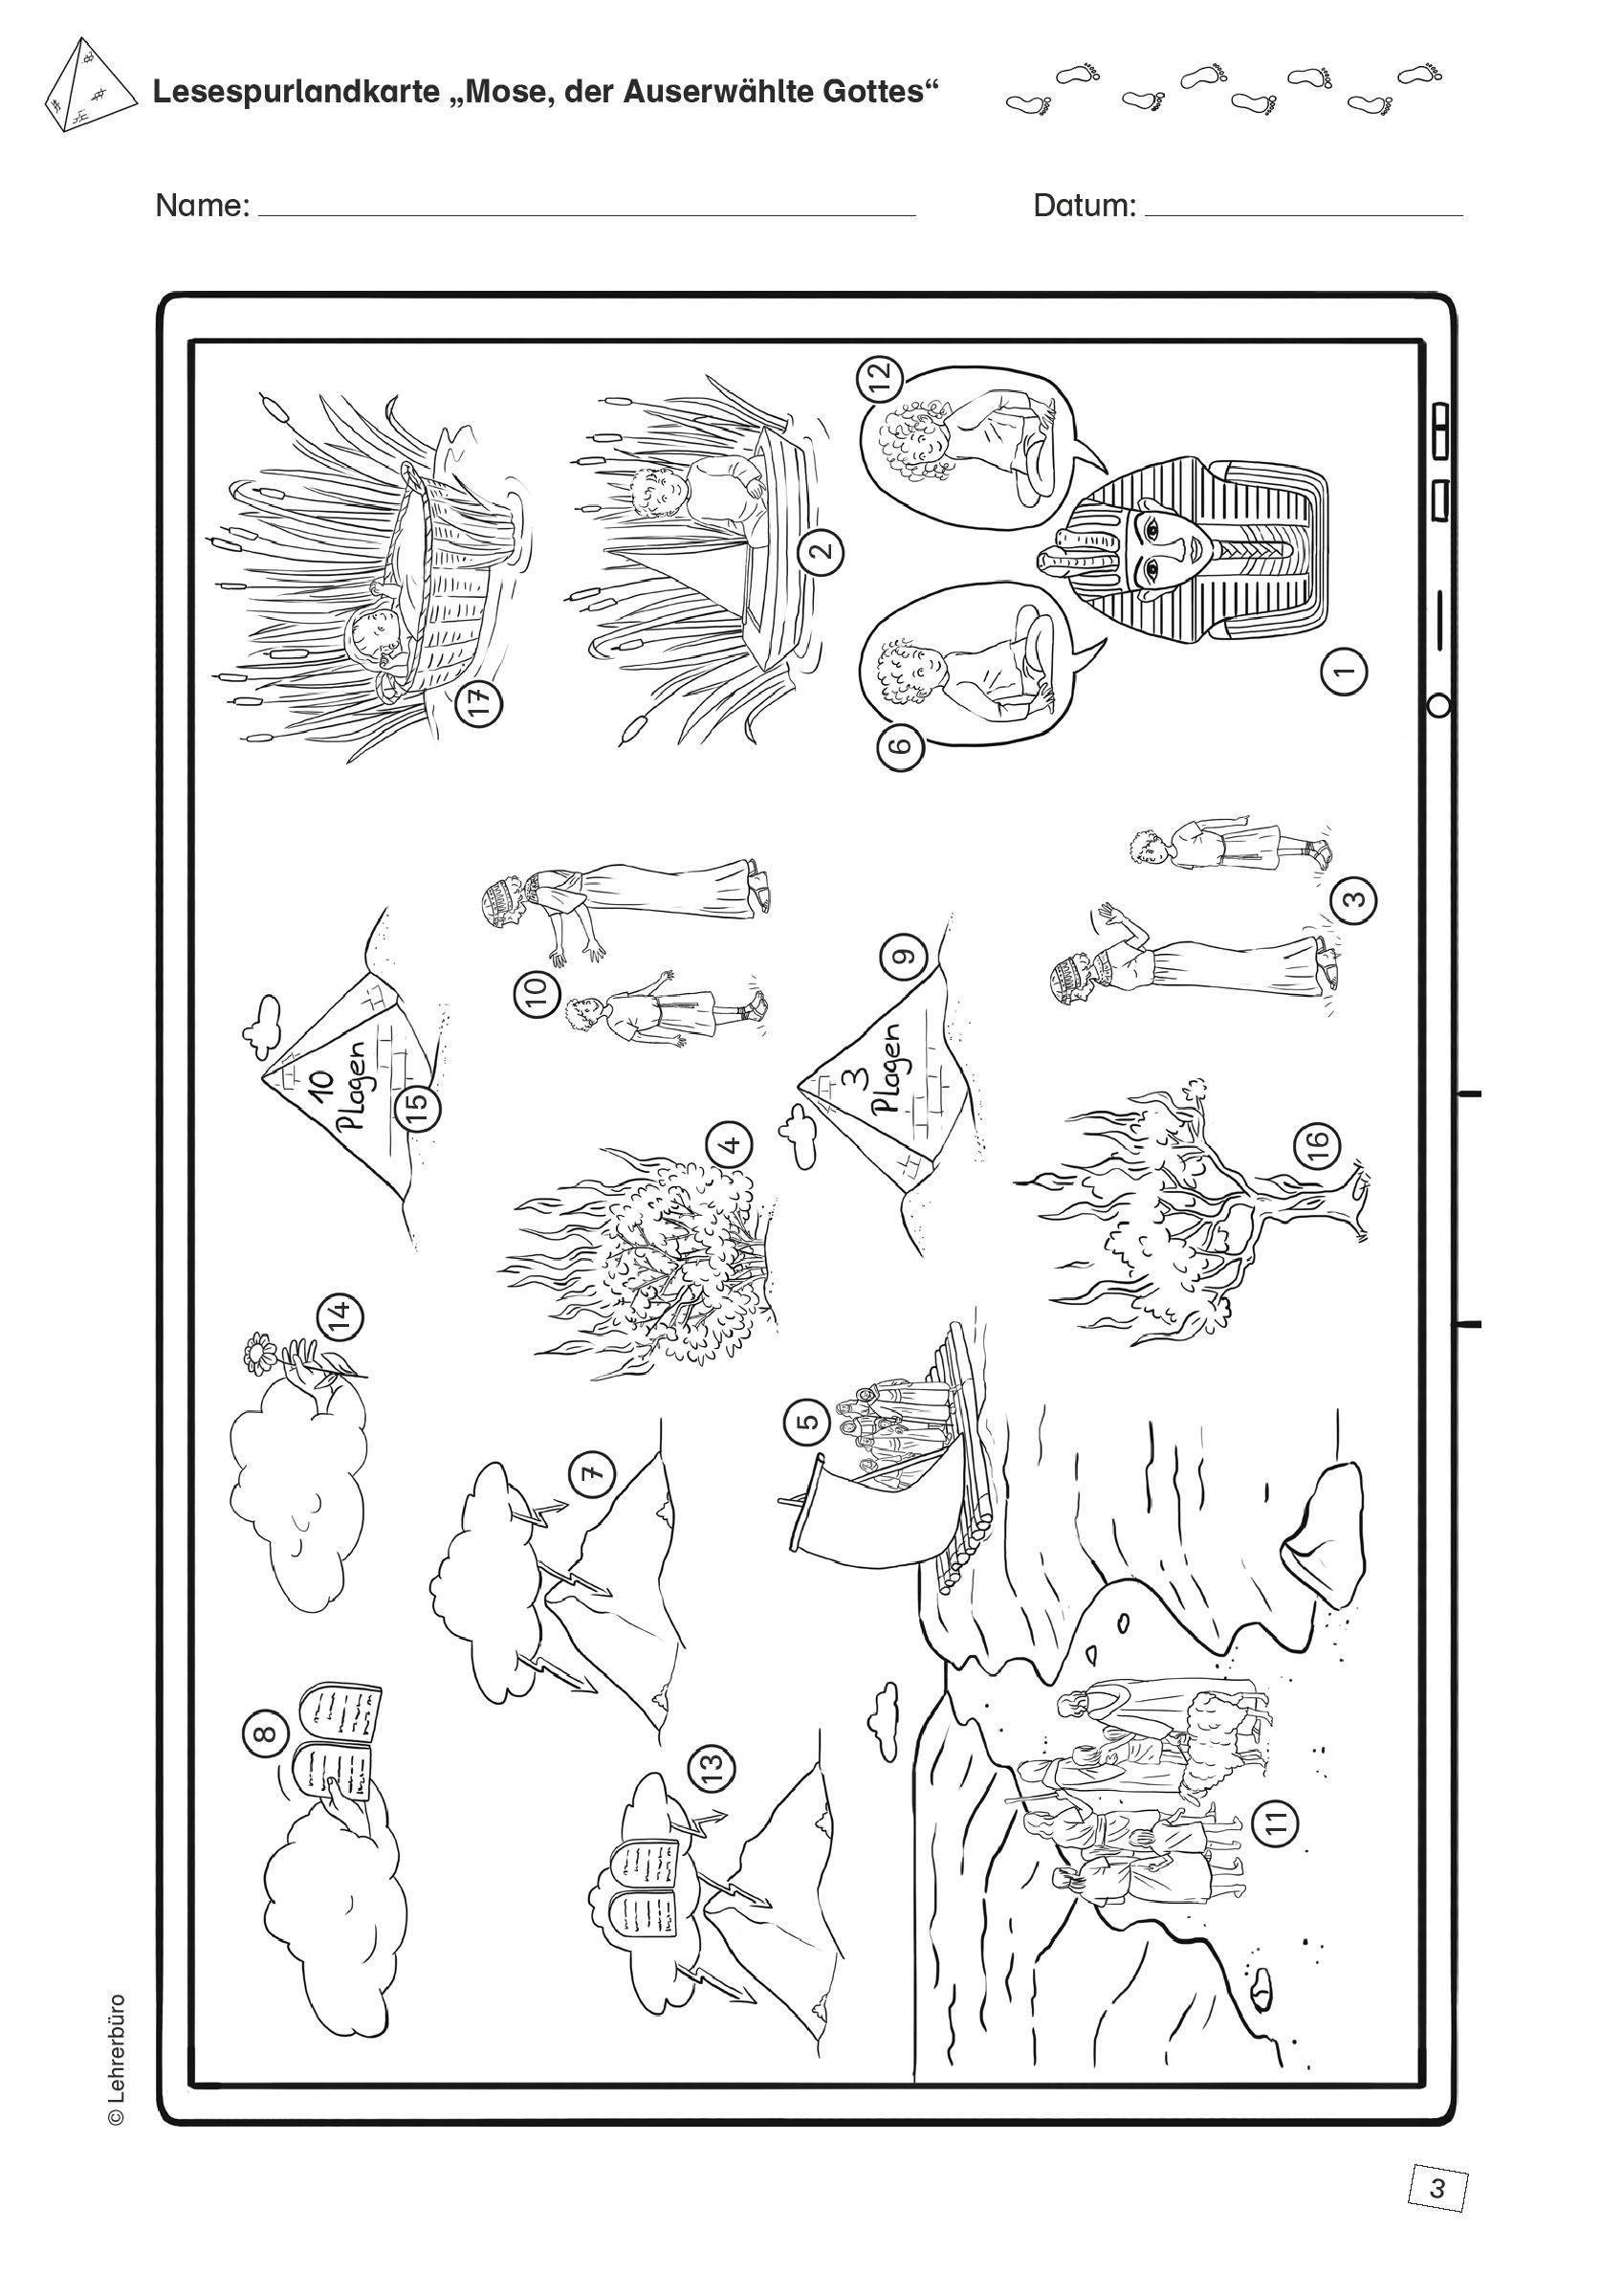 Verkehrserziehung Kindergarten Ausmalbilder Genial Arbeitsblätter · Grundschule · Lehrerbüro Galerie